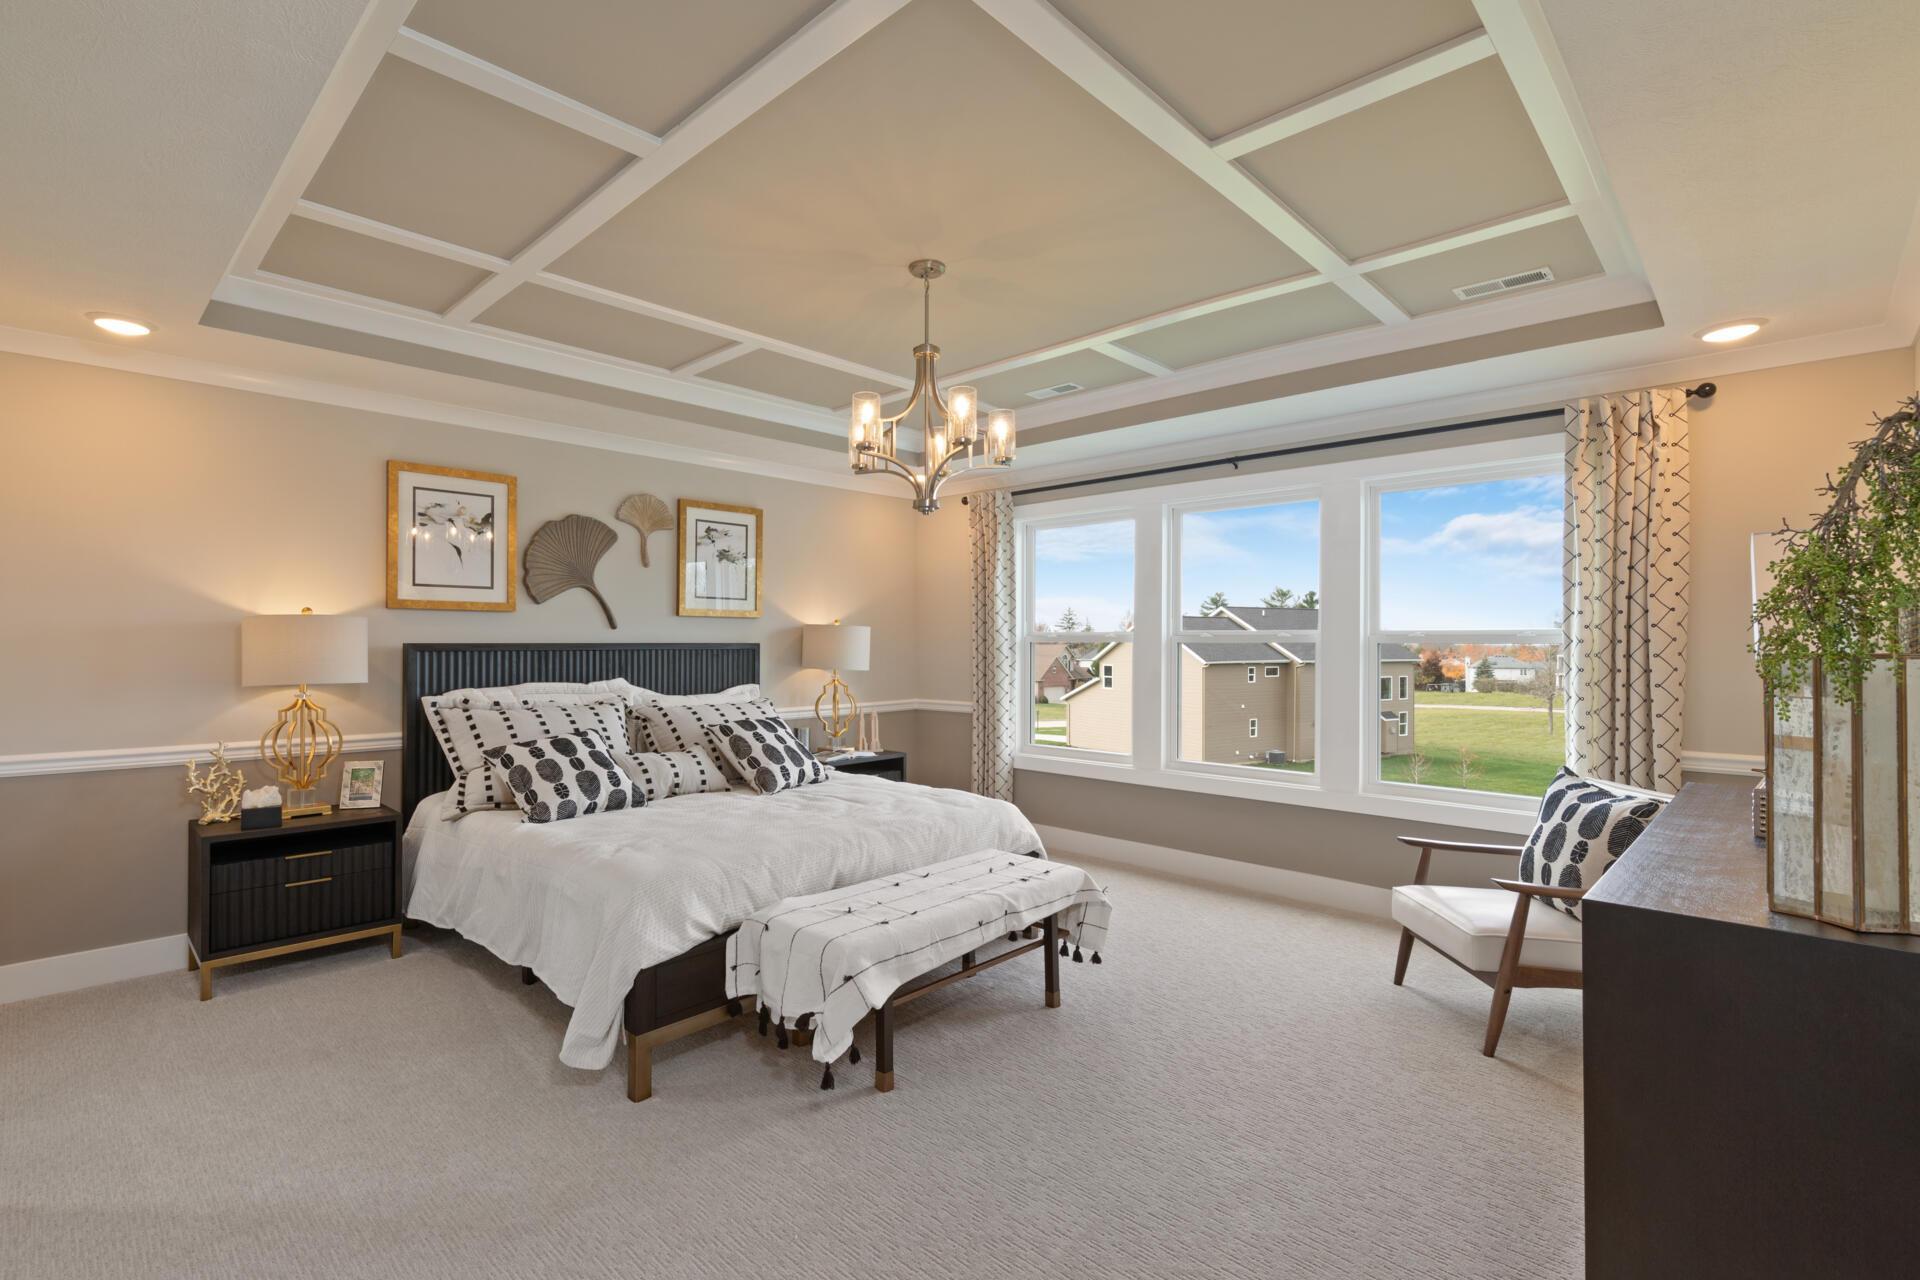 The Belleville Owner's Suite